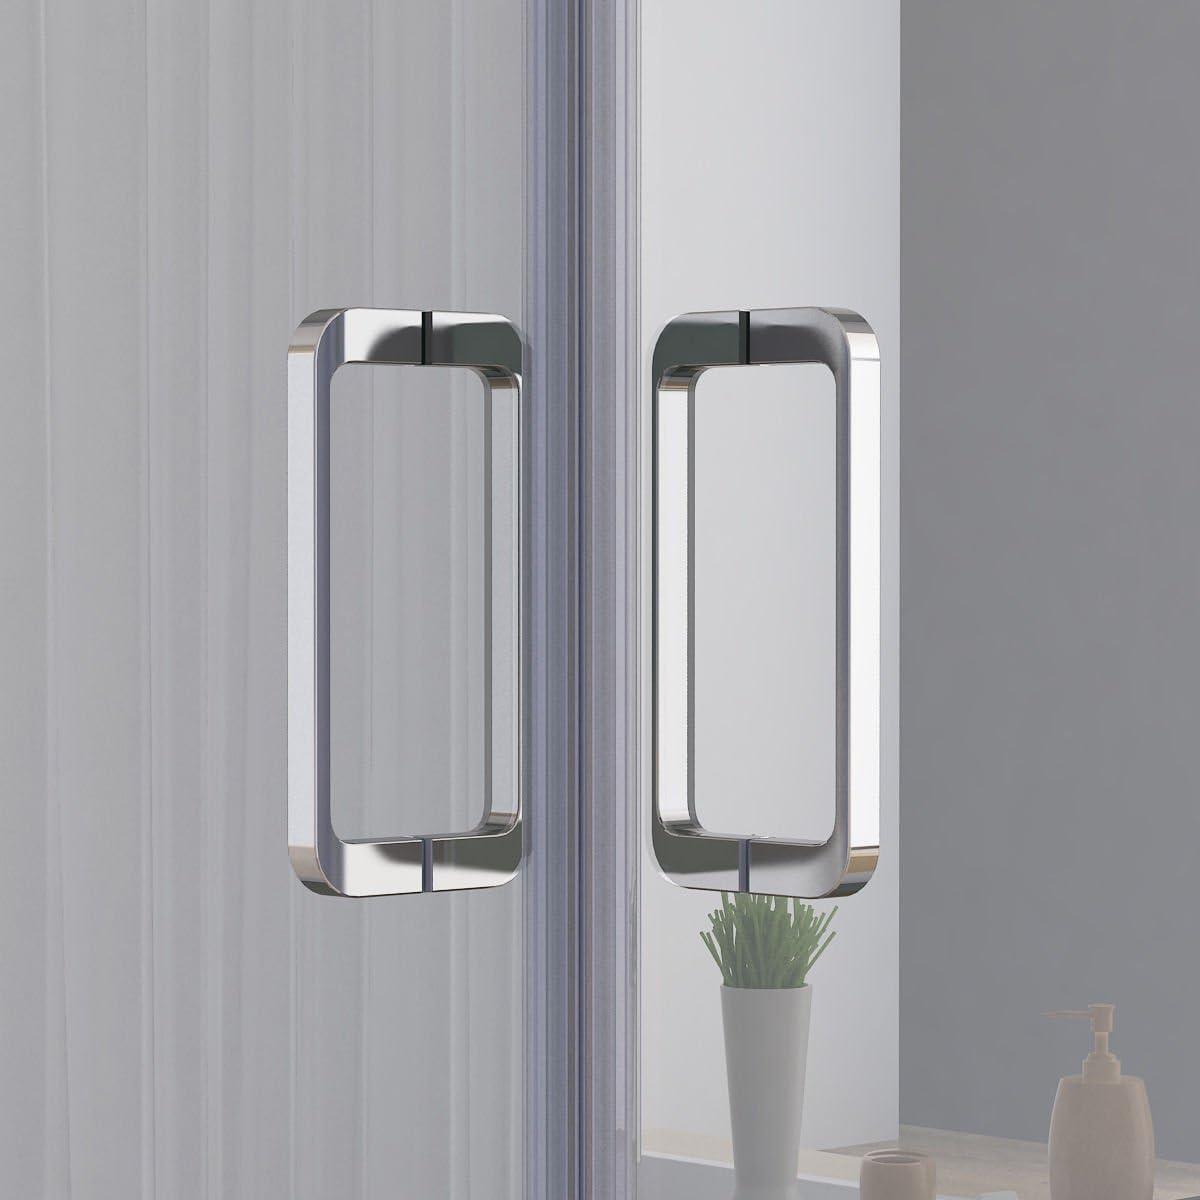 80 x 80 x 195 cm cabinas de ducha redonda ducha Mampara Puerta ...